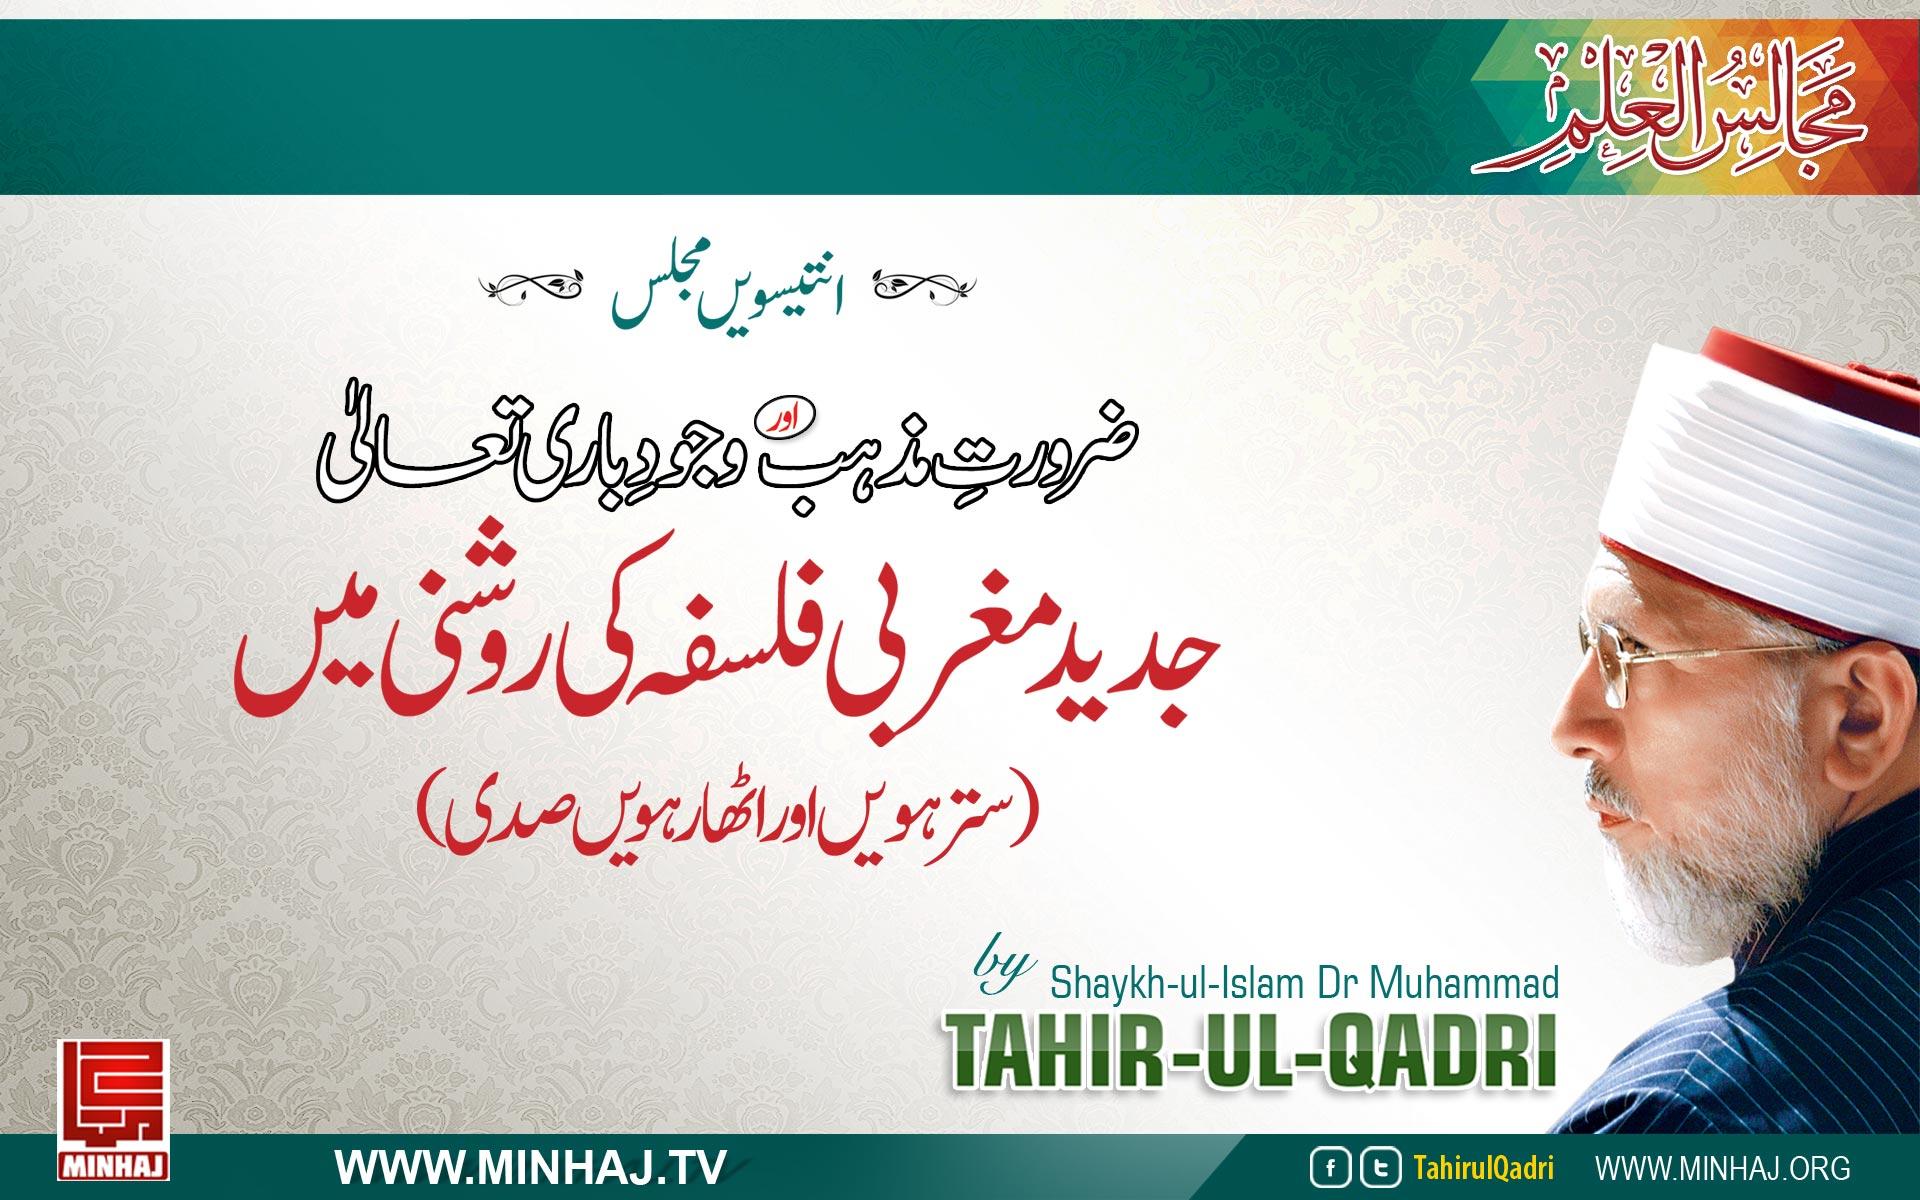 Majalis-ul-ilm (Lecture 29) - by Shaykh-ul-Islam Dr Muhammad Tahir-ul-Qadri